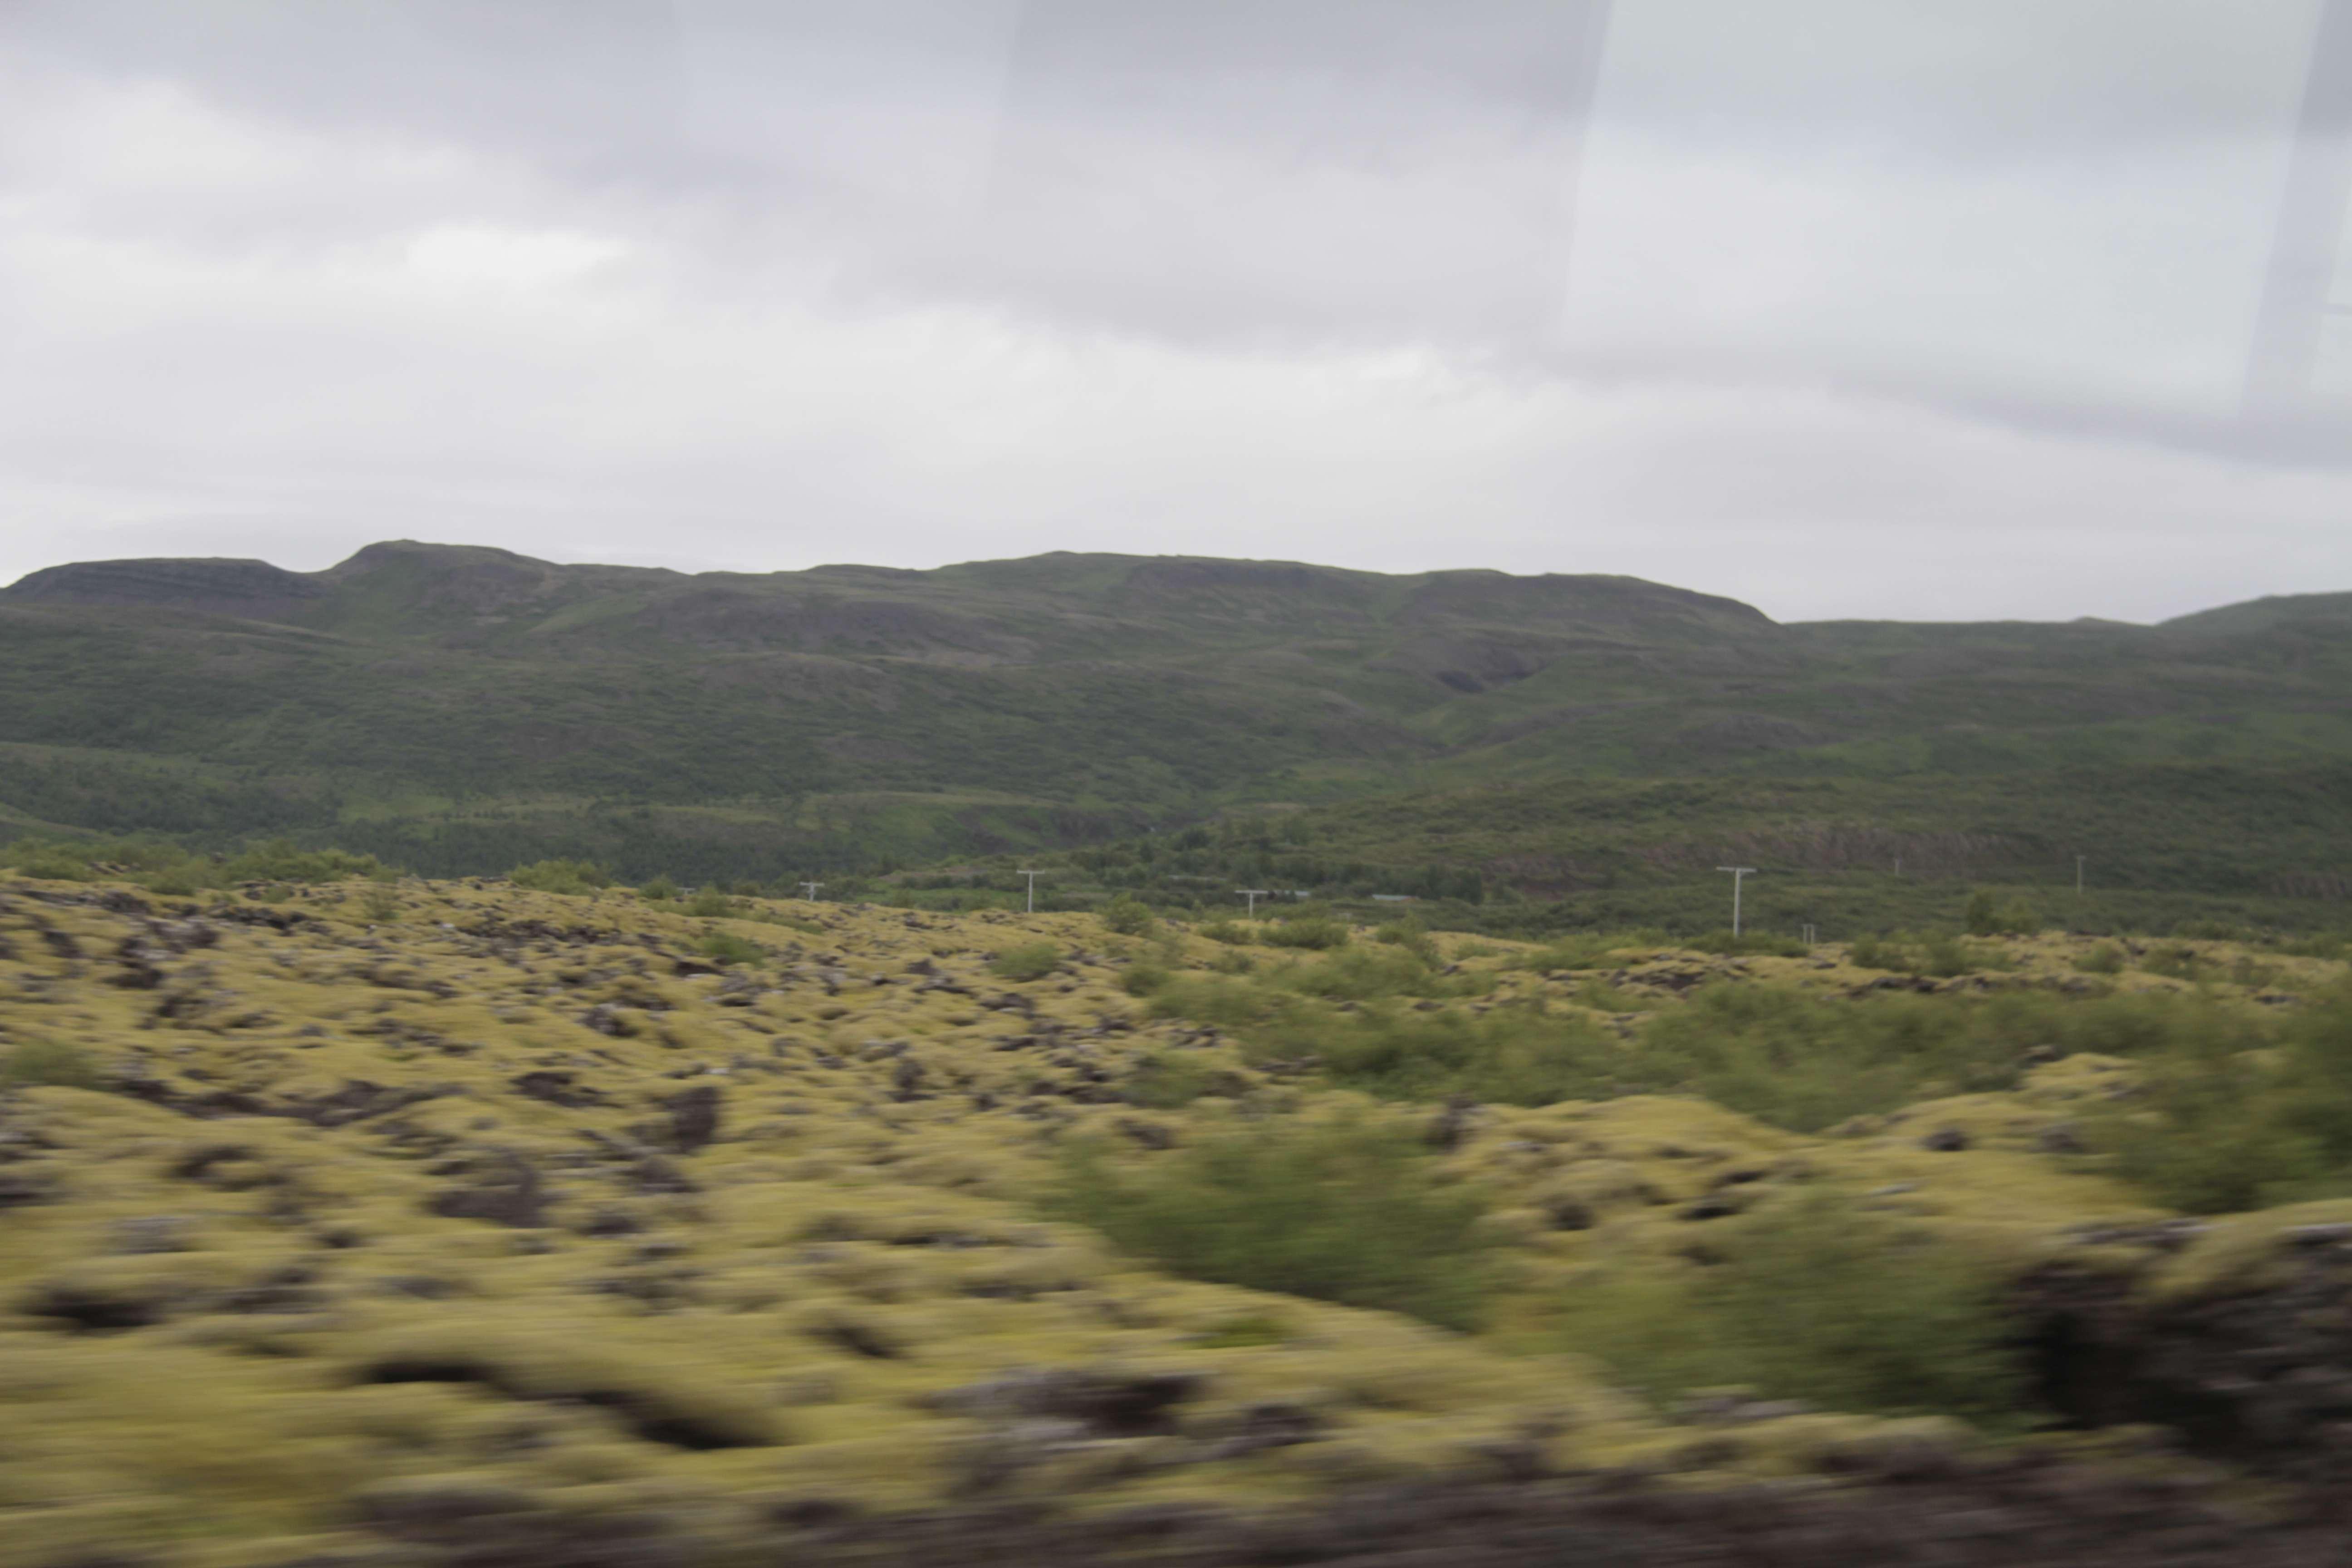 Islande_0113 route Reykjavik-Akureyri 10 juillet